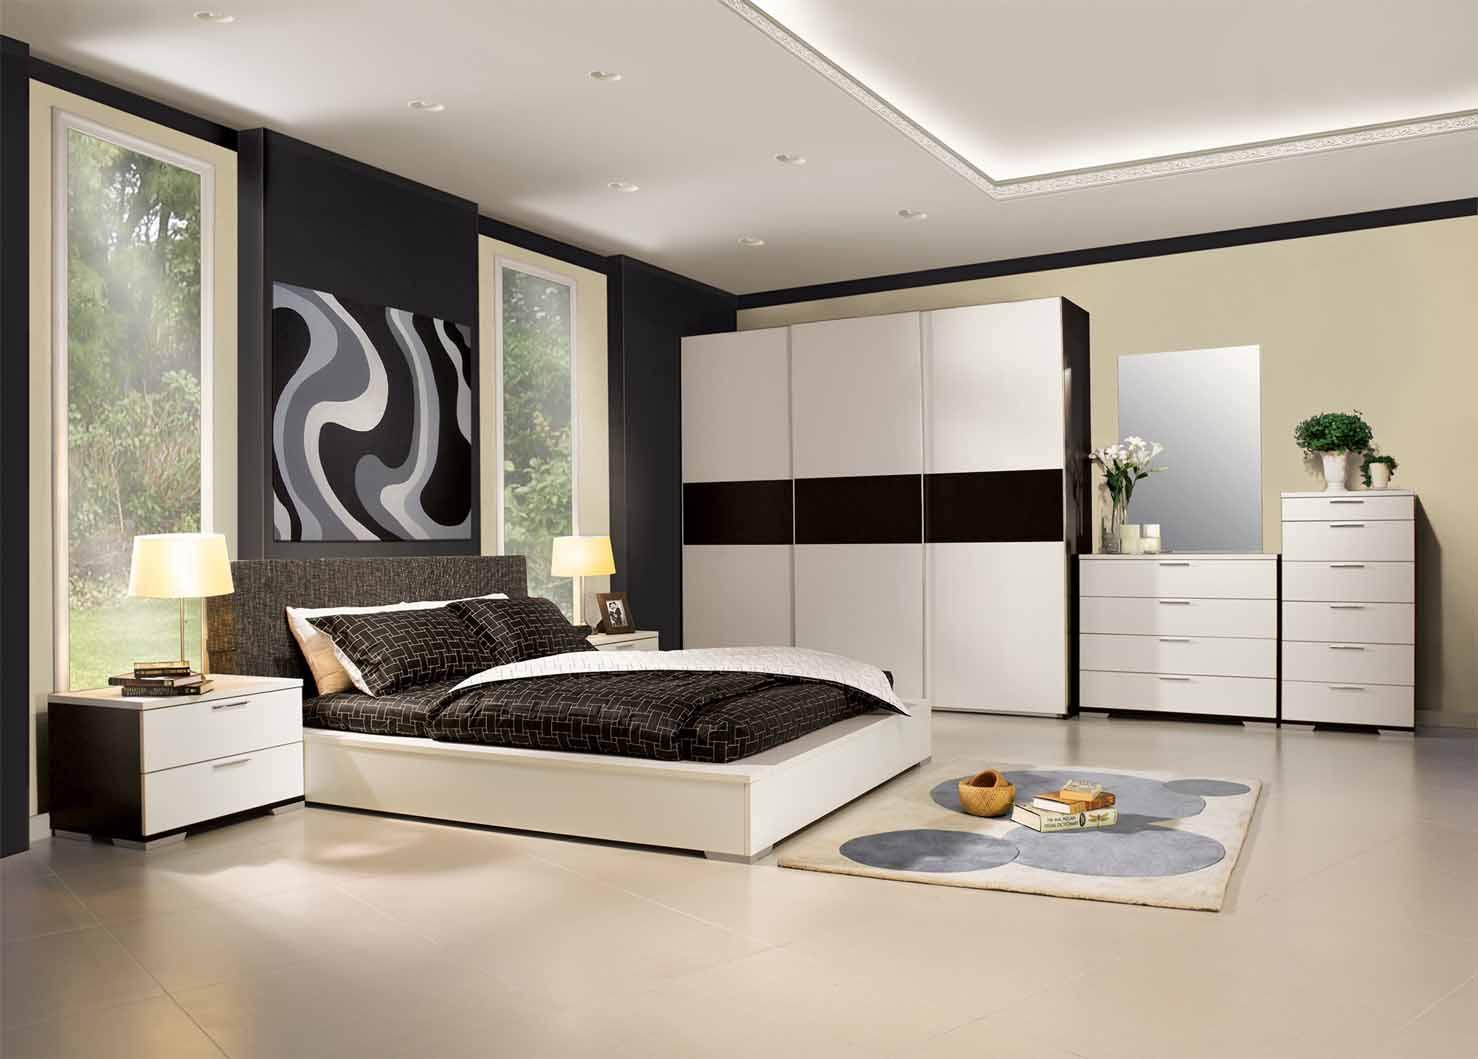 bedroom furniture - Bedroom Furniture Photos